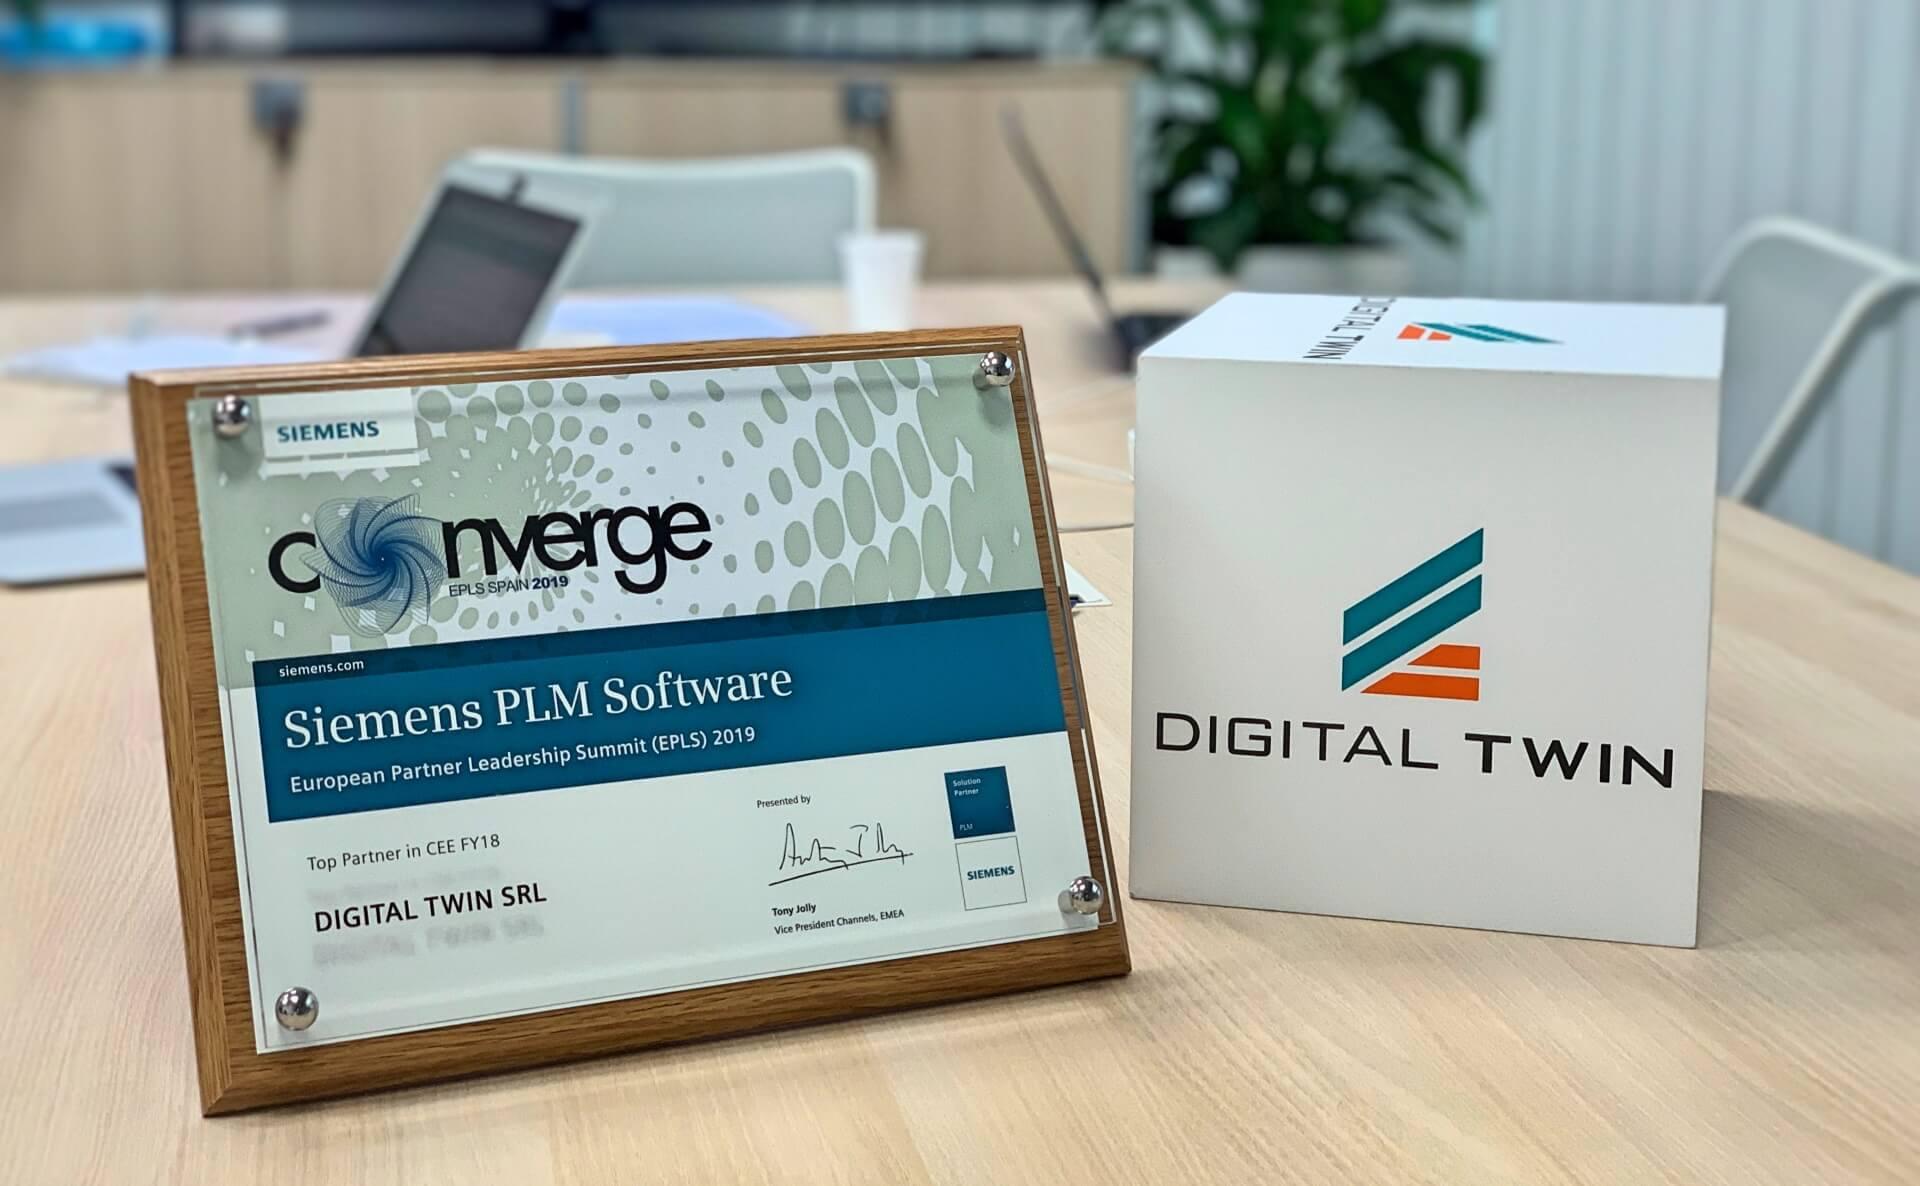 premiu-digital-twin-top-partner Siemens